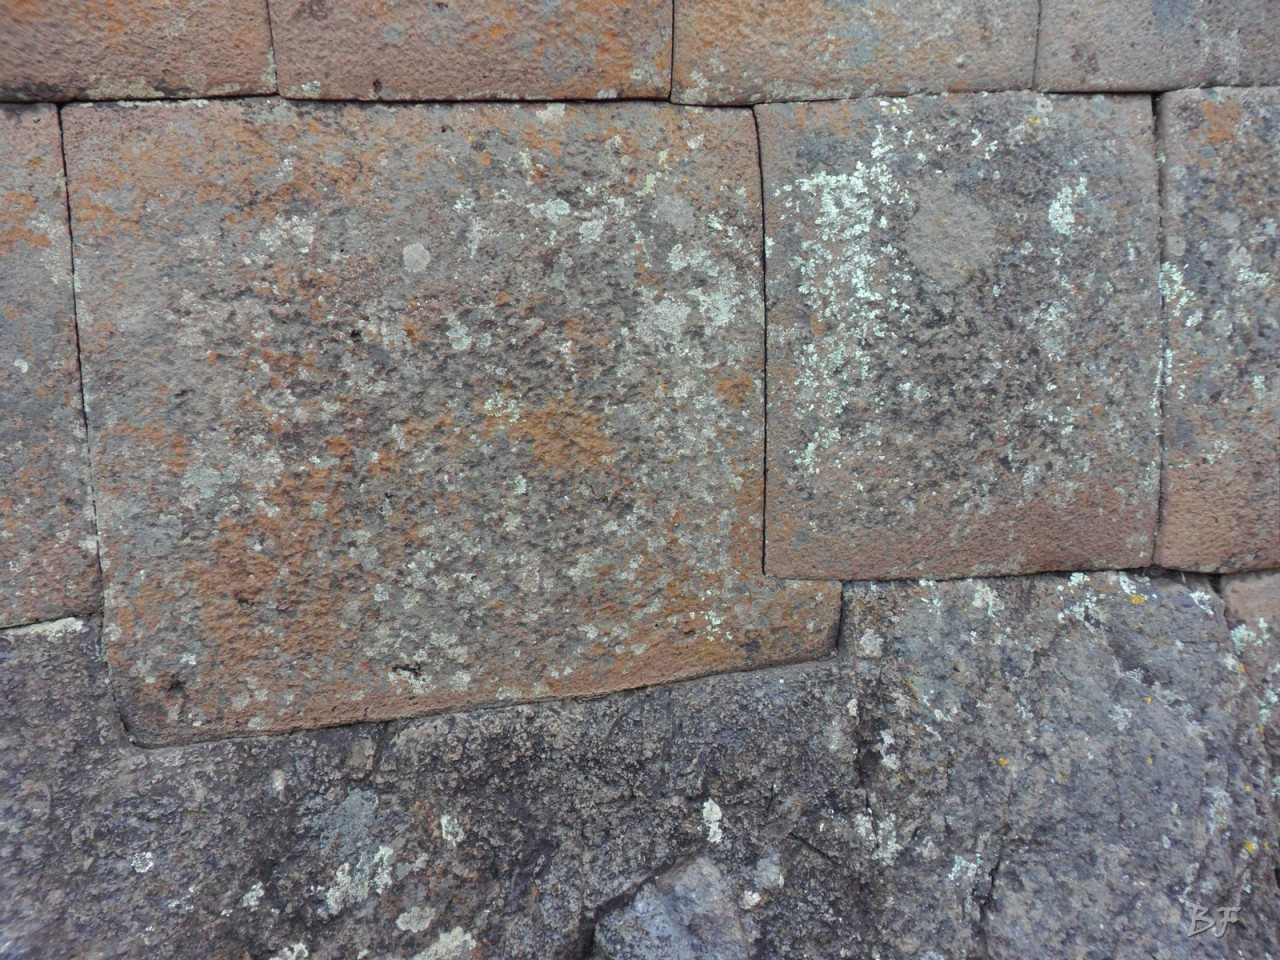 Mura-Poligonali-Megaliti-Altari-Rupestri-Pisac-Cusco-Perù-55